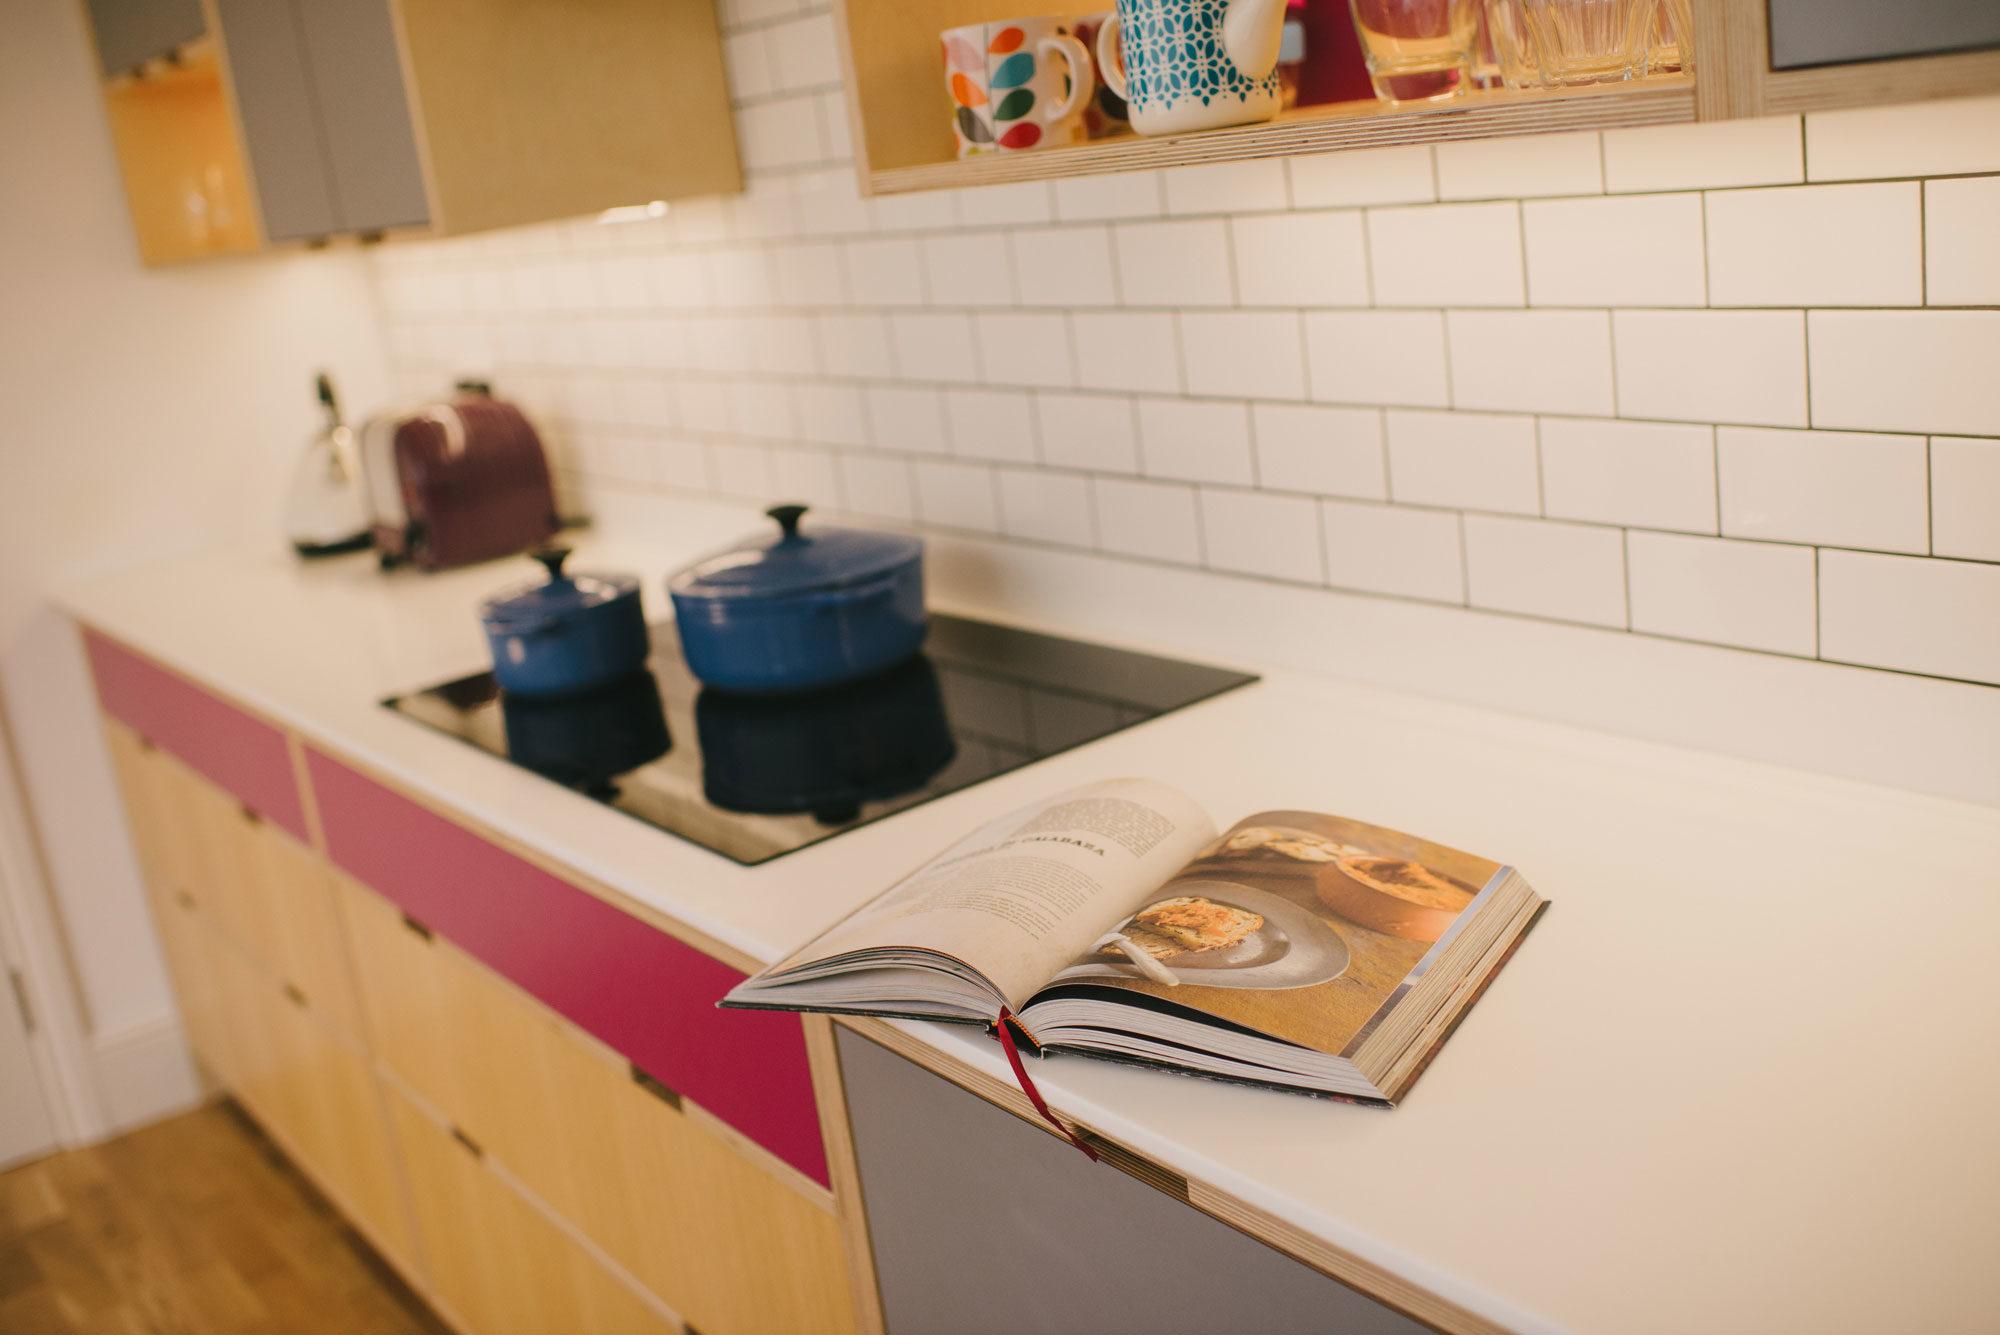 Corian worktop of pink and grey kitchen